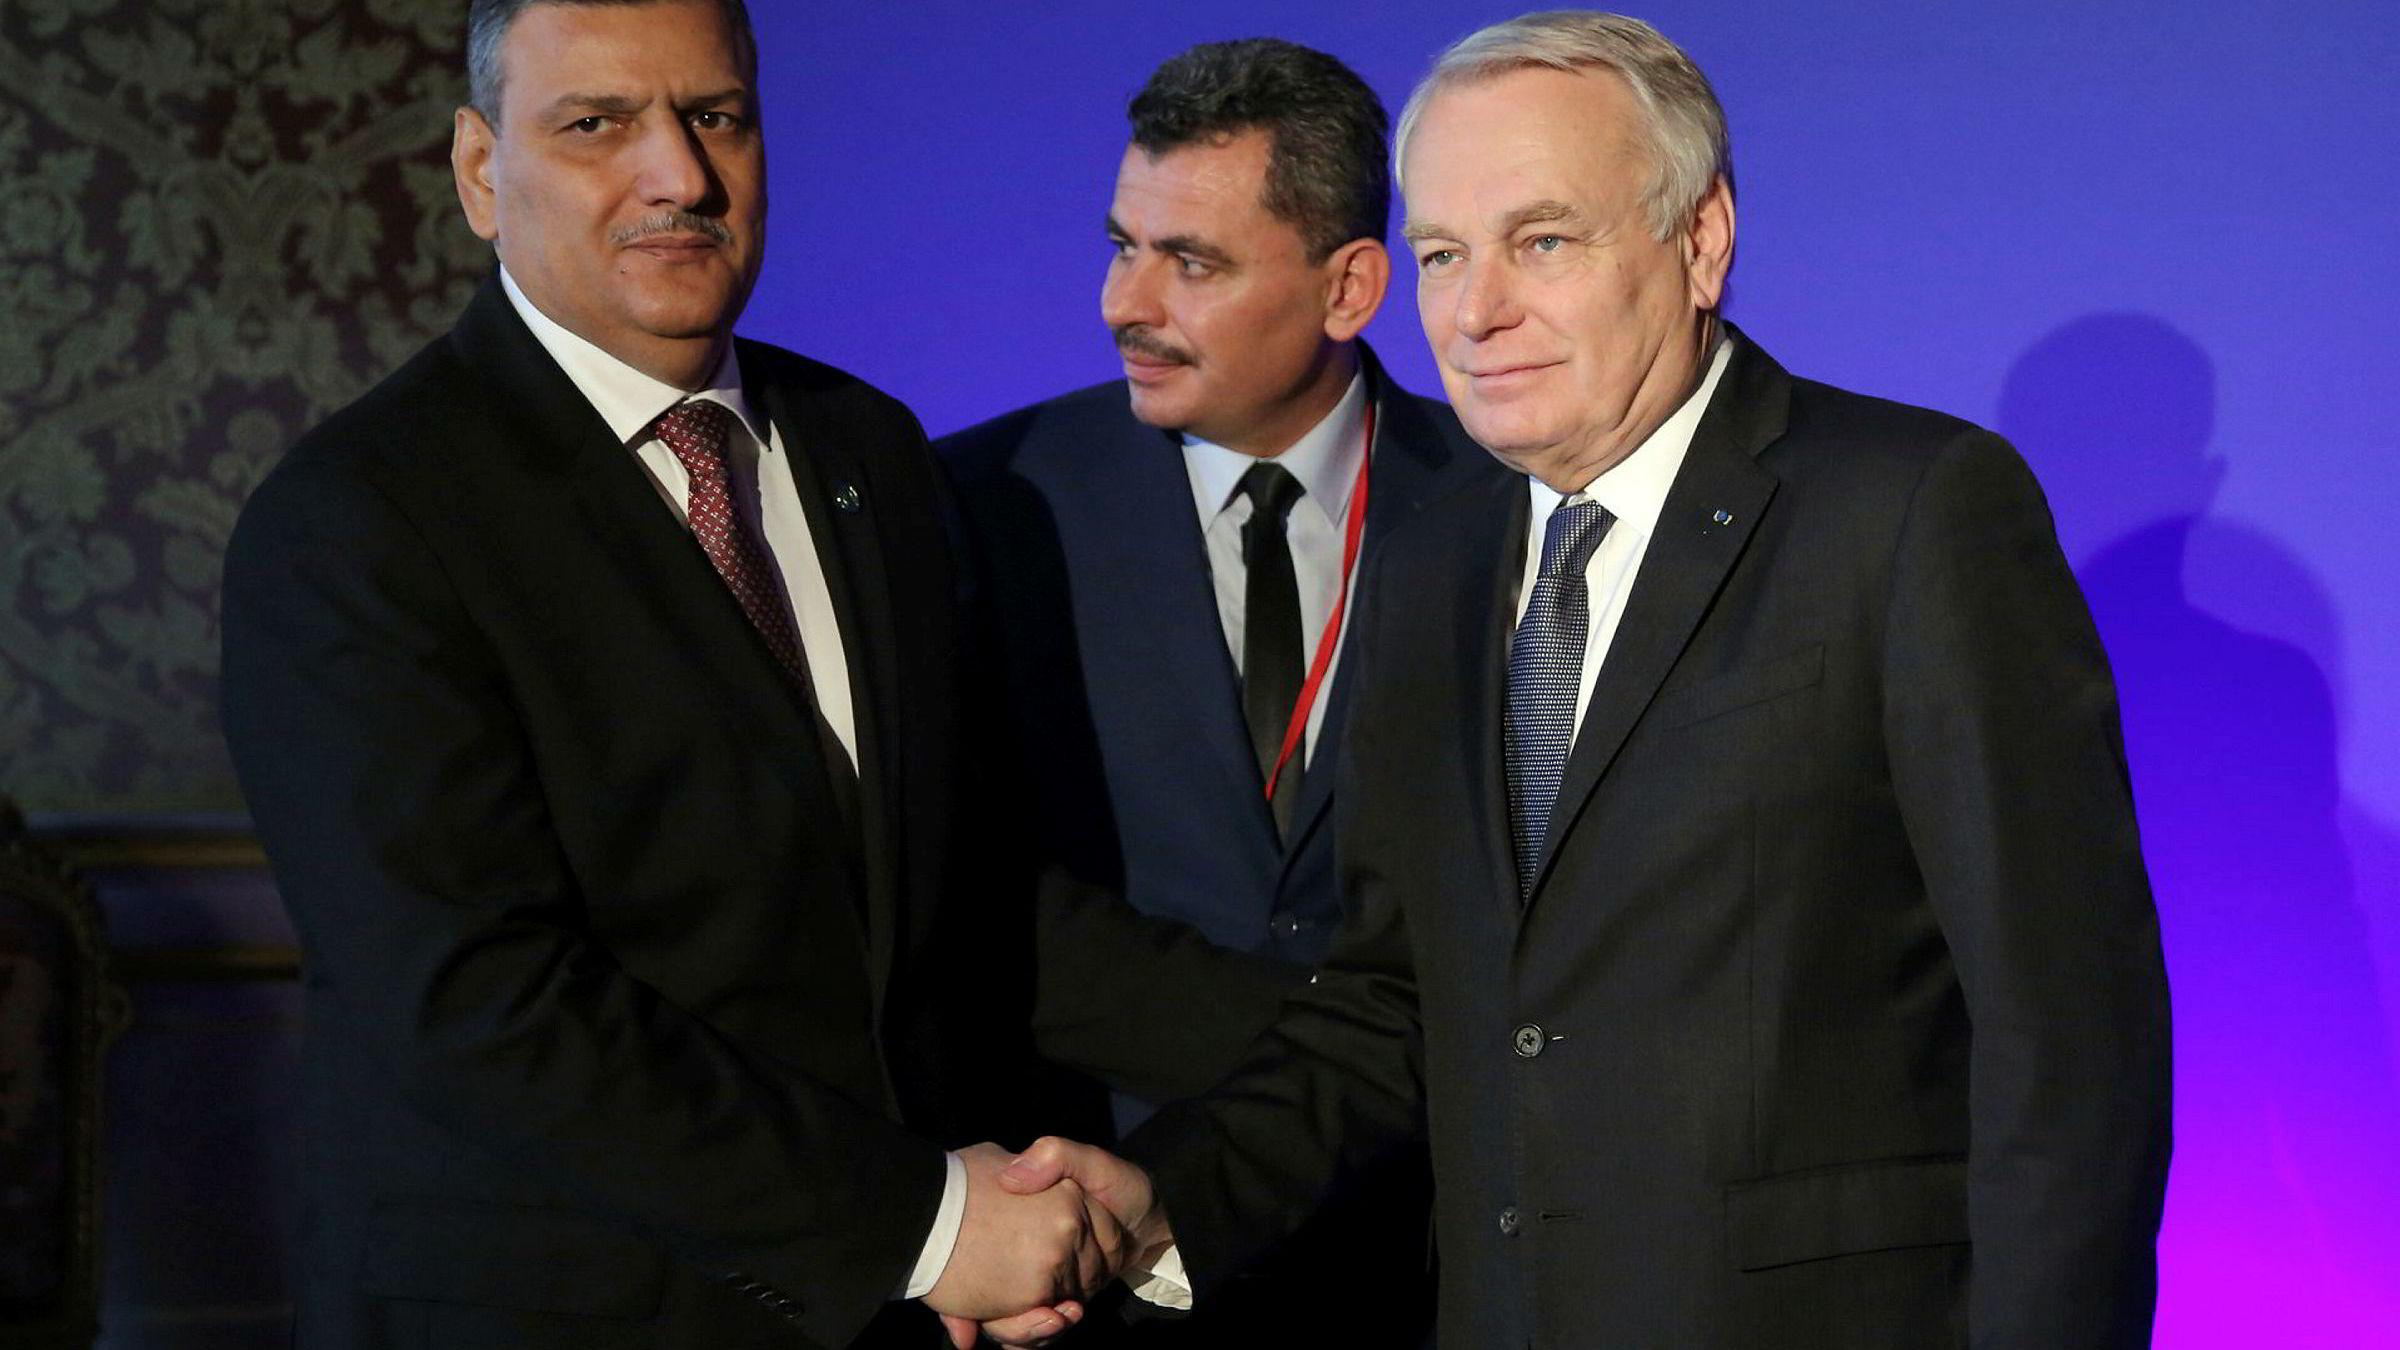 Riad Hijab (t.v) sjefskoordinator for forhandlingene tar hånden til Frankrikes utenriksminister, Jean Marc Ayrault (t.h.), mens presidenten i Alepps lokale Brita Hagi Hasan står ved lørdag.